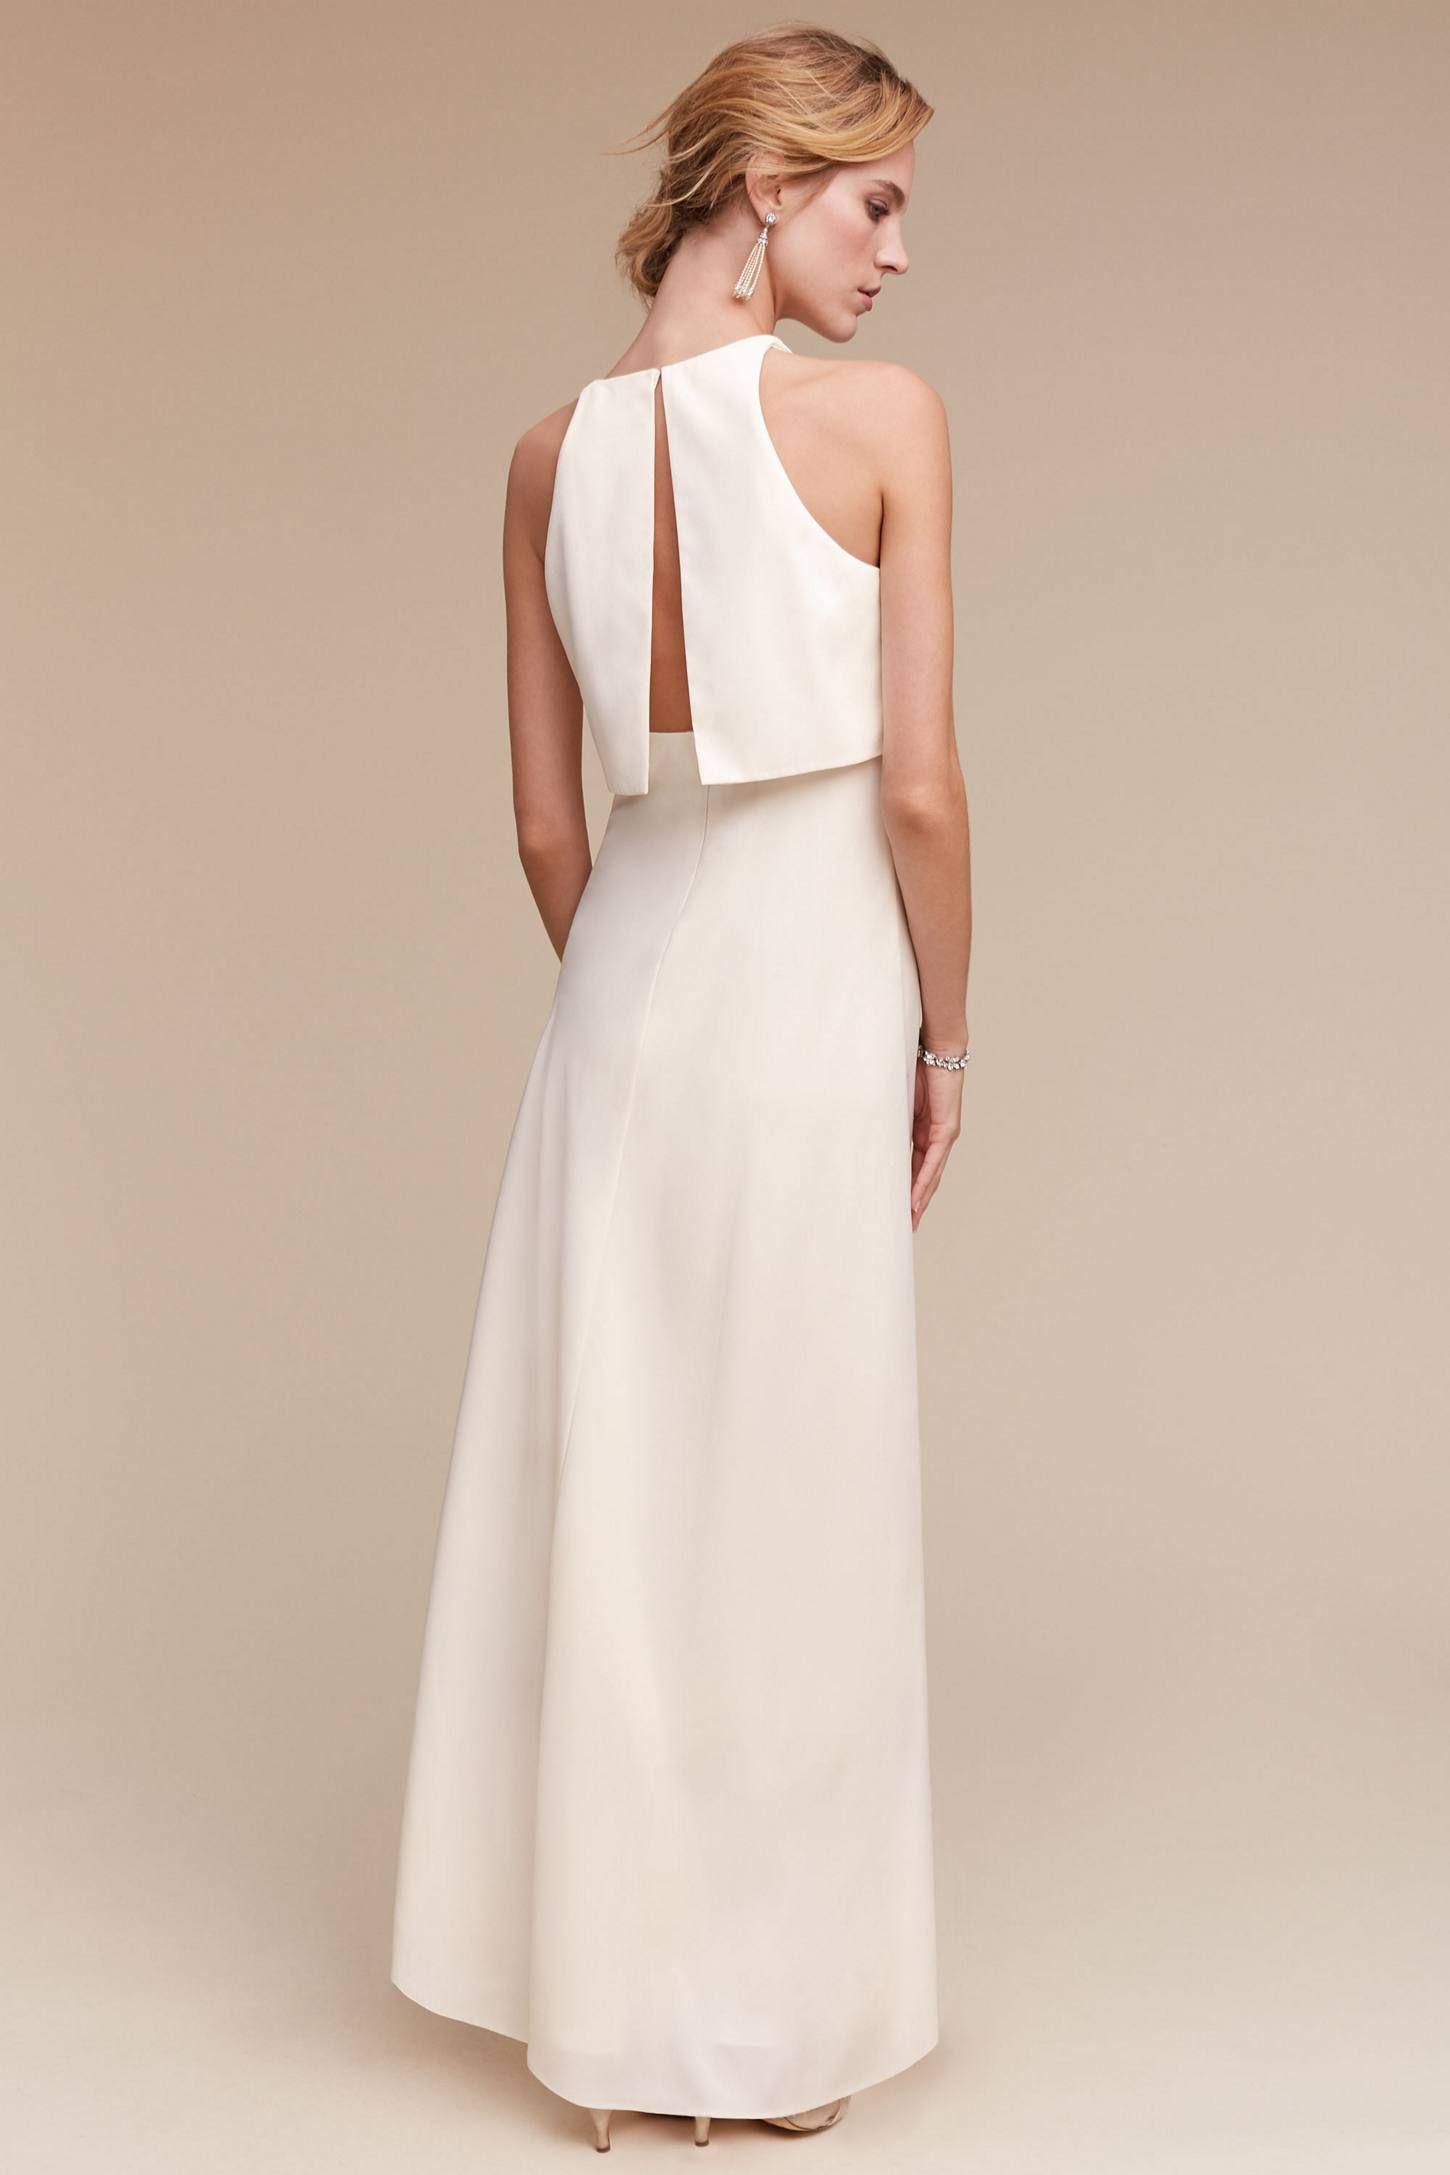 ee072b32531f Slide View  2  Iva Crepe Maxi Maxi Dress Wedding